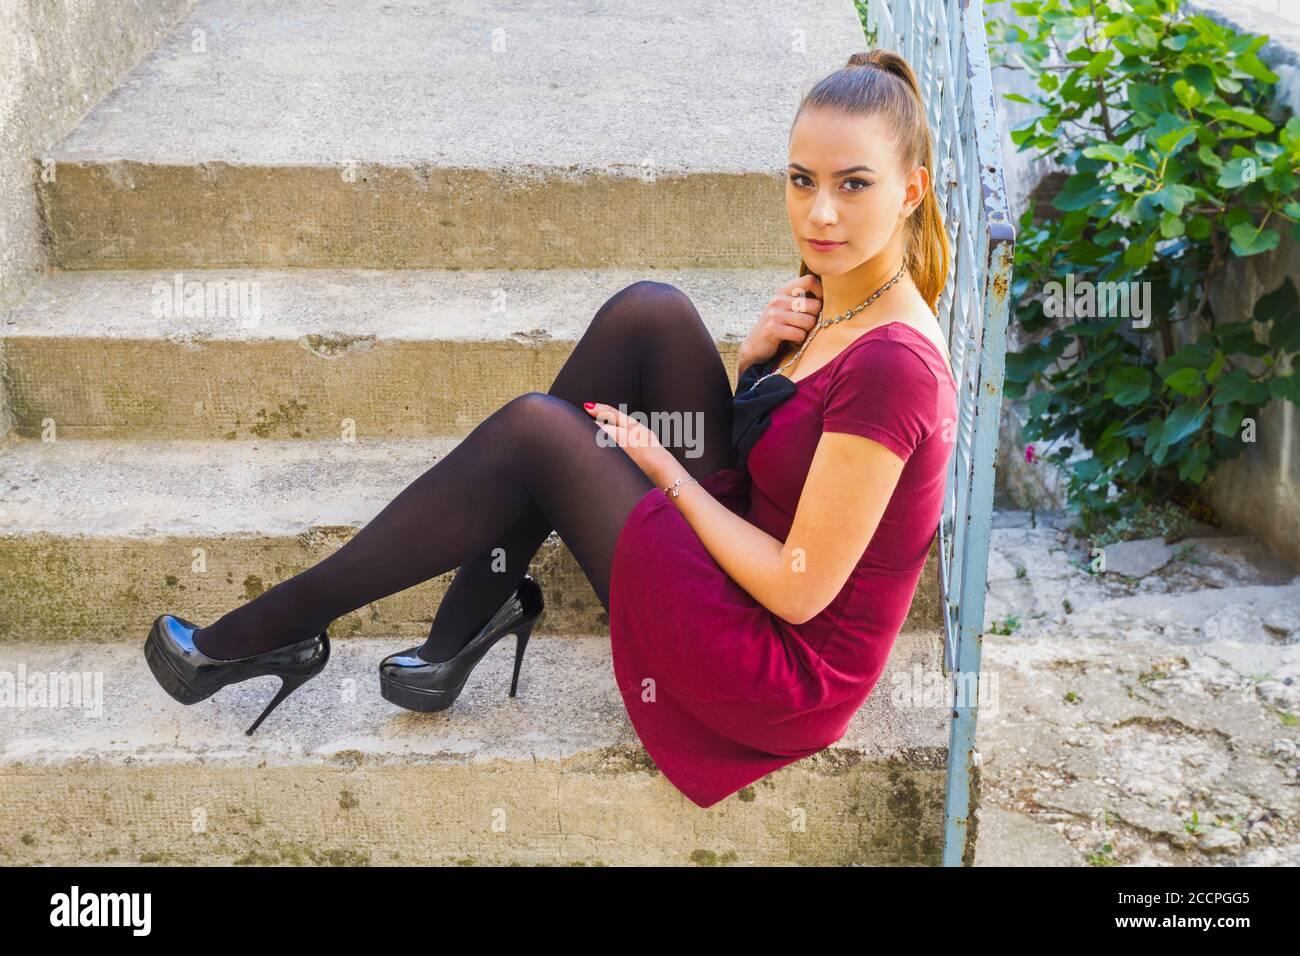 Teengirl legs heels Burgundy Red minidress and Black opaque nylon tights ponytail pony-tail Bruunete hair eyeshot eyes eye contact looking at camera Stock Photo